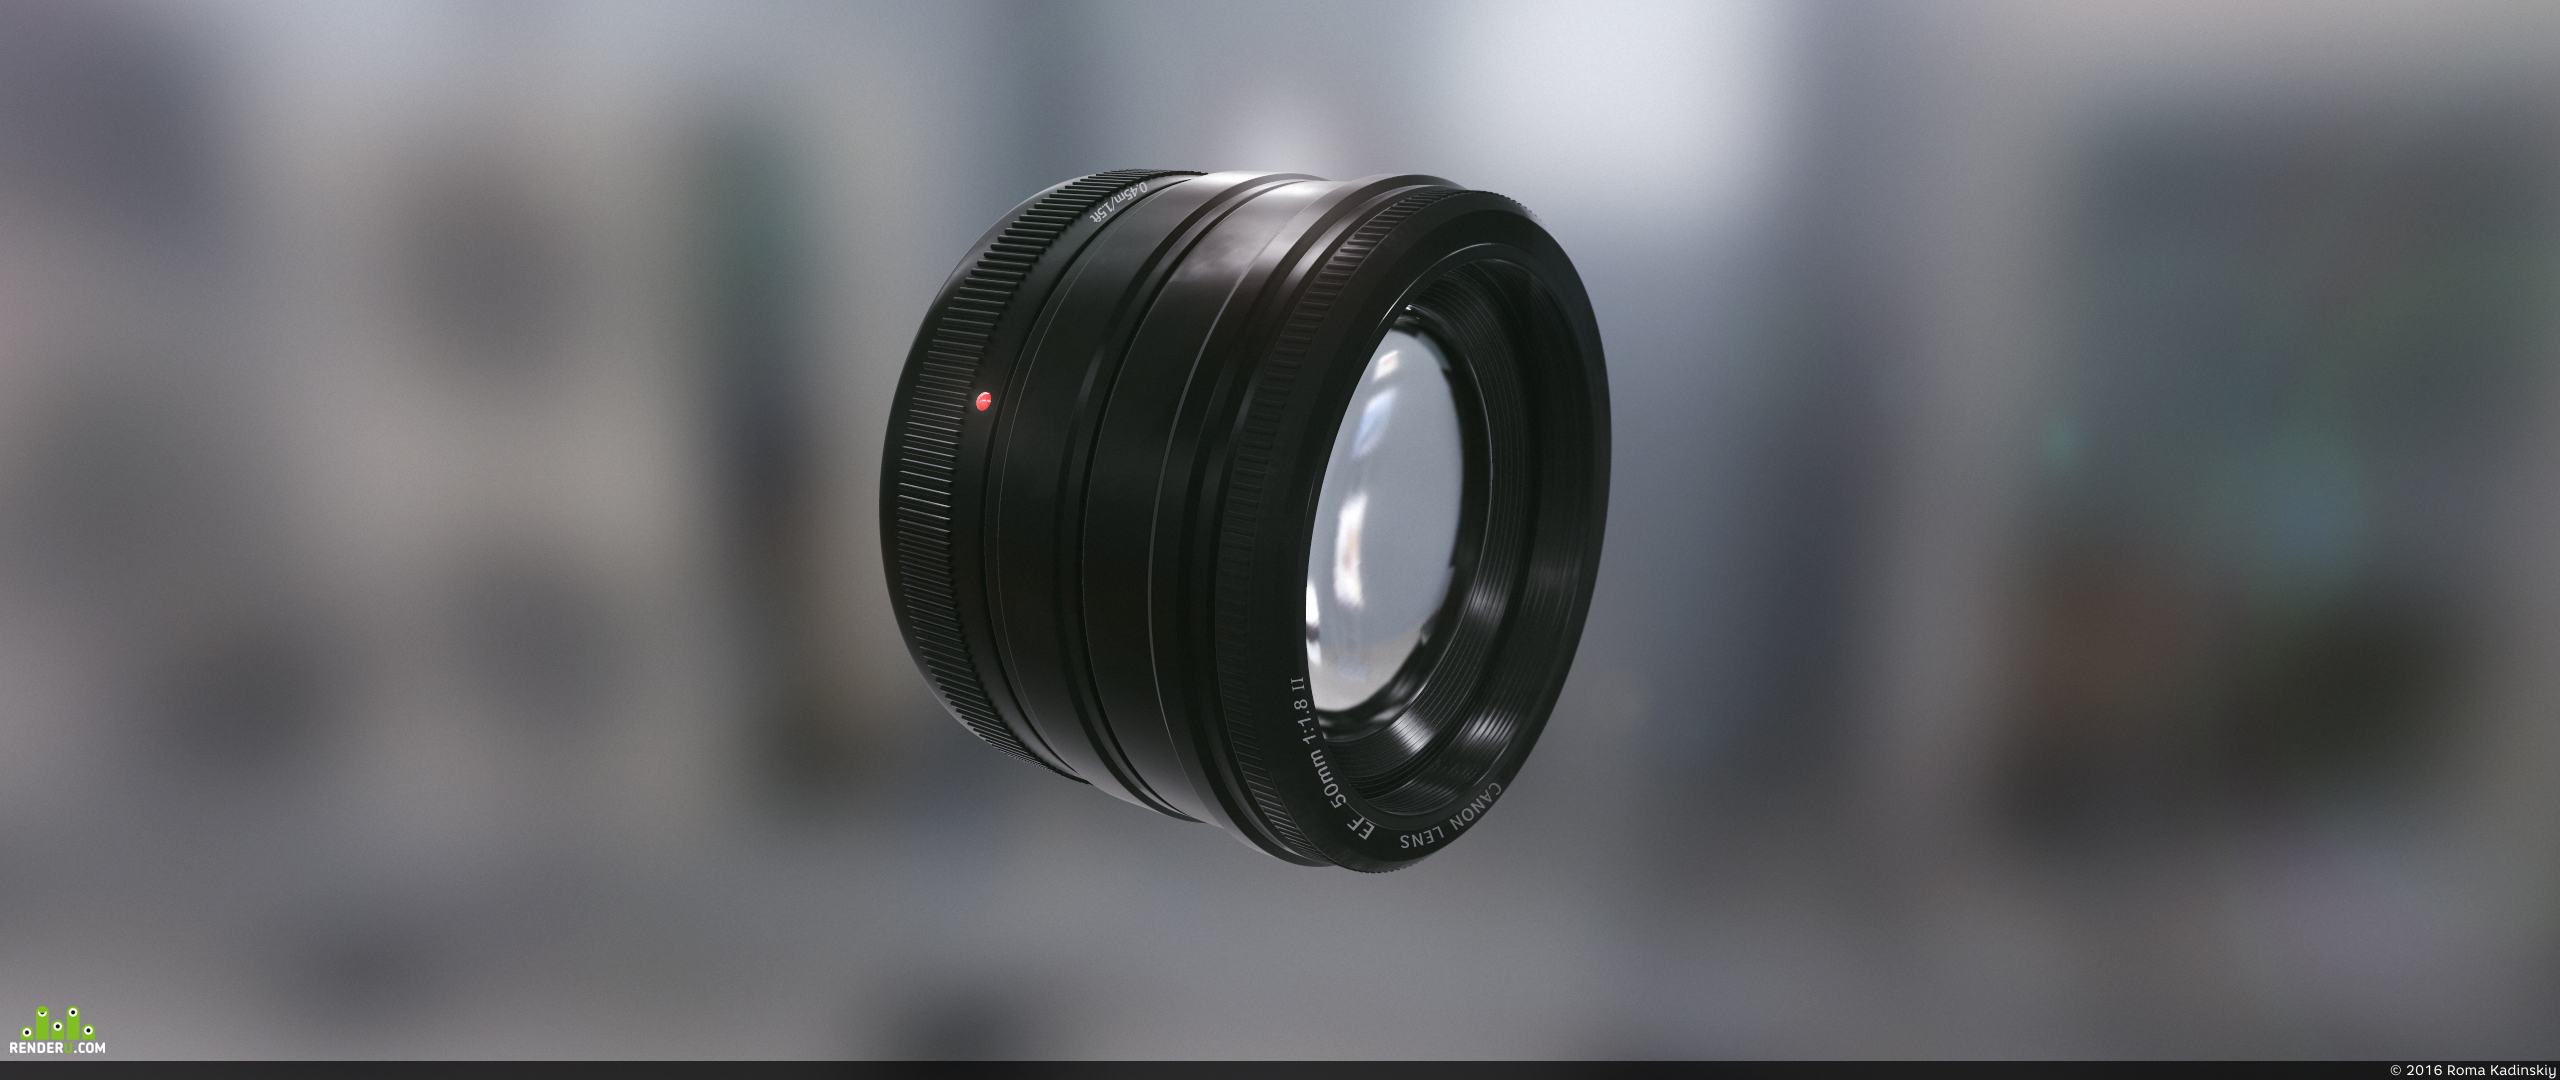 preview Объектив для фотоаппарата